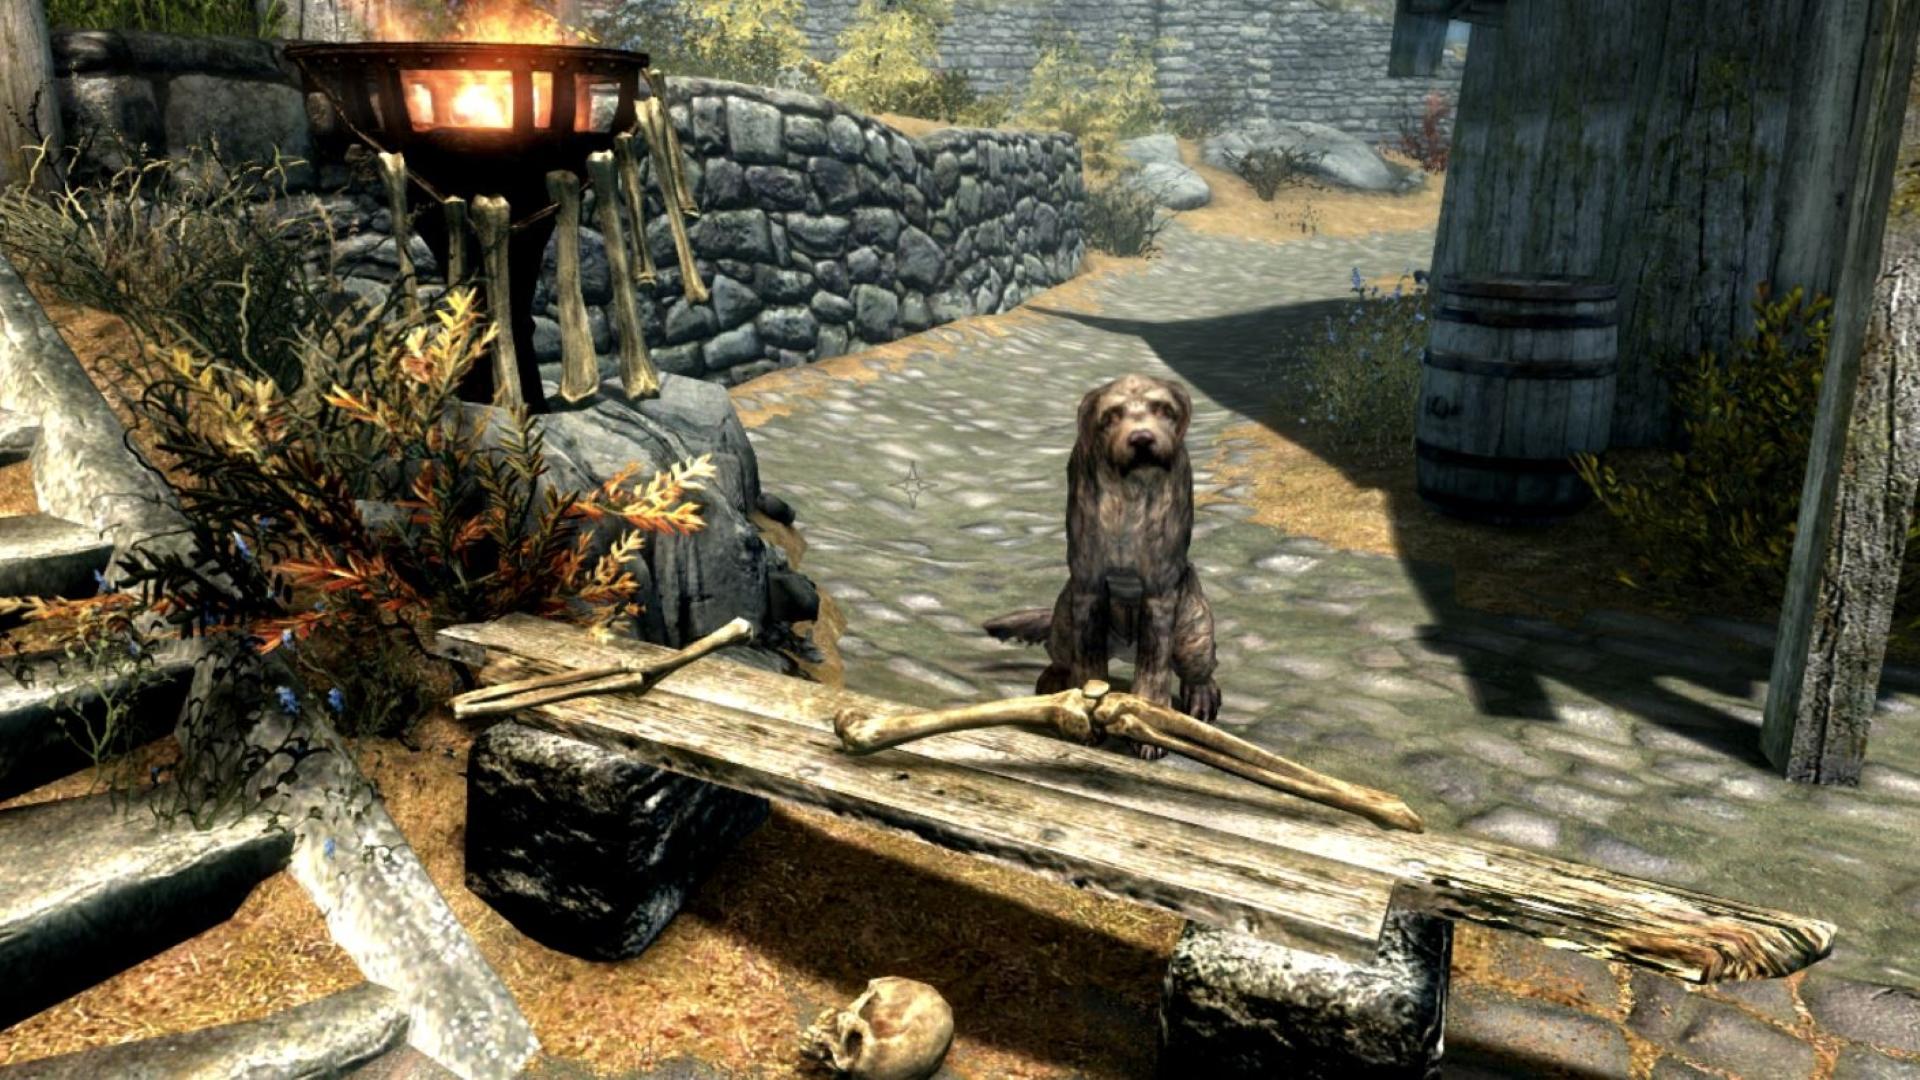 This Skyrim mod adds an adorable dog that sells you human bones